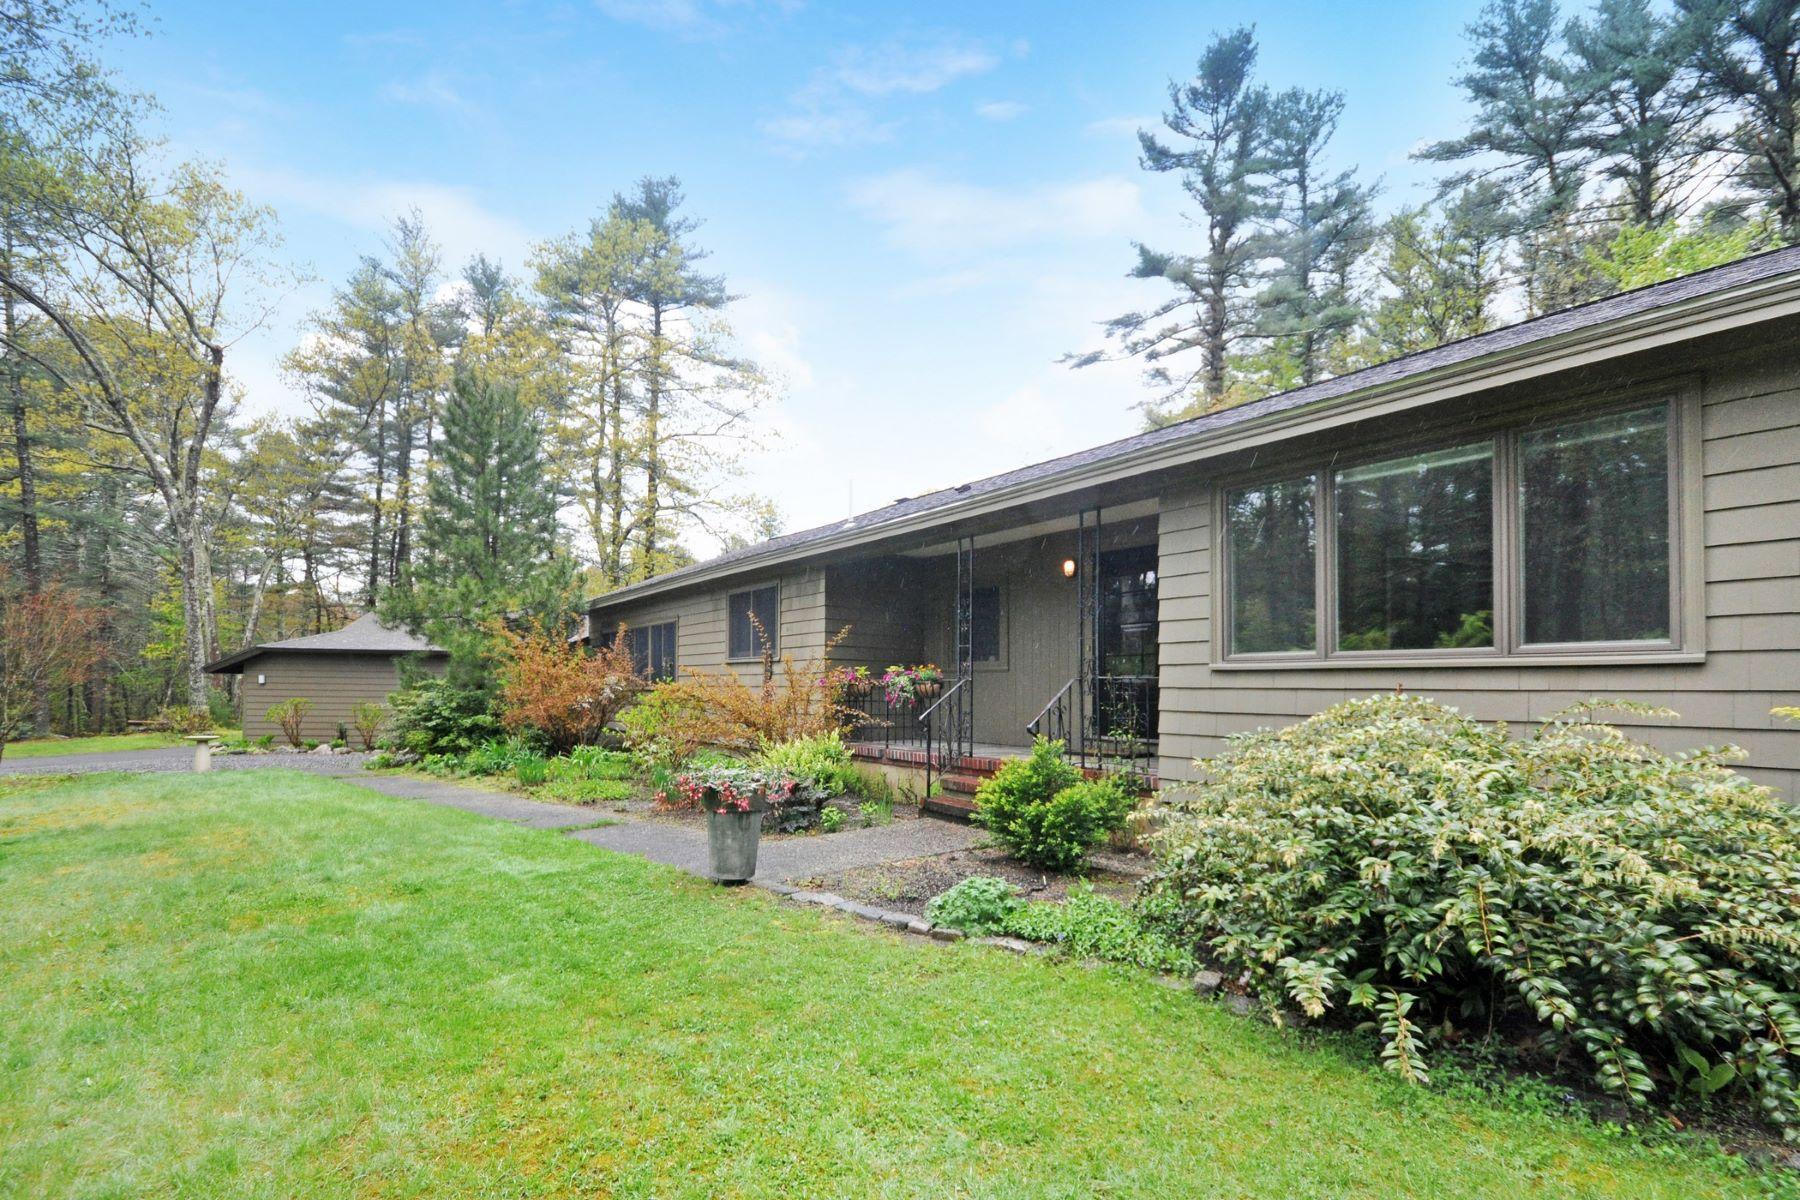 Single Family Home for Active at 187 Partridge Lane, Carlisle 187 Partridge Ln Carlisle, Massachusetts 01741 United States